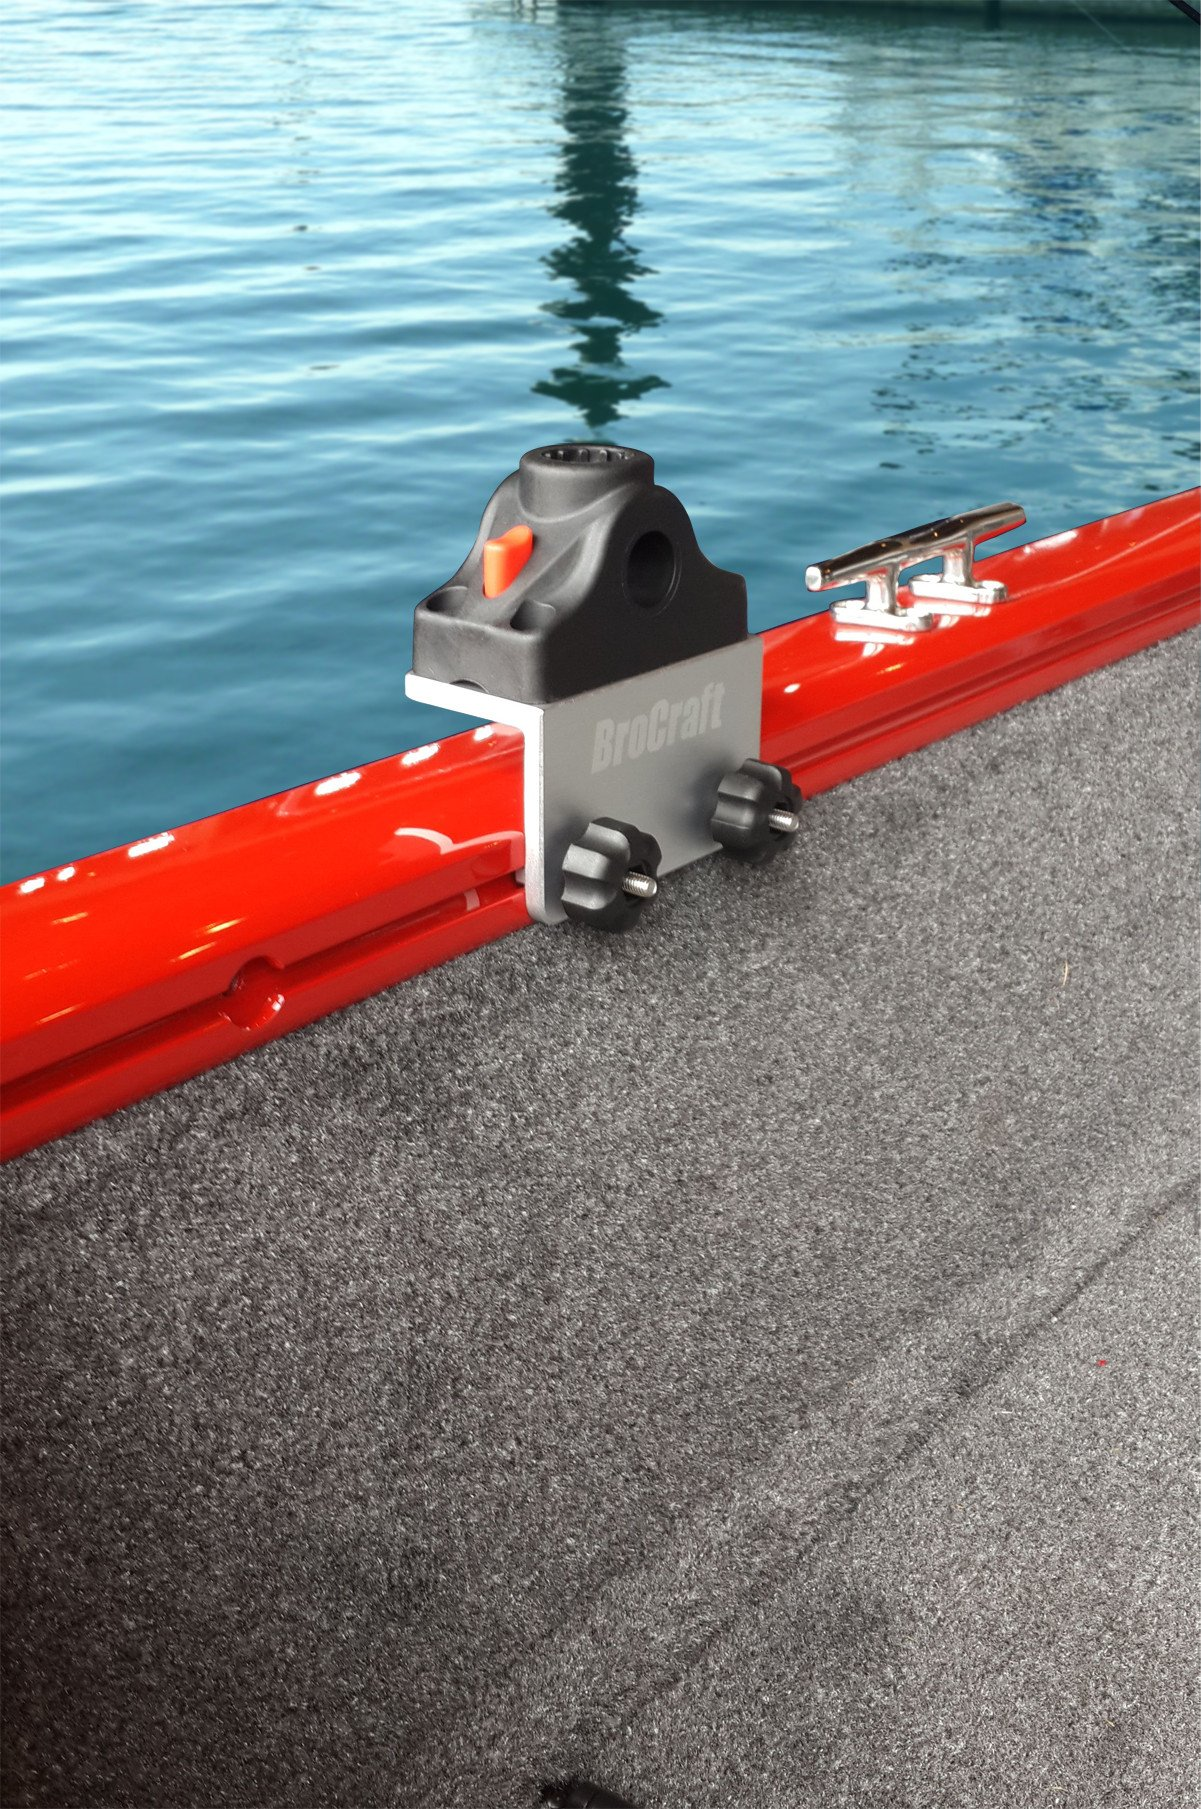 Brocraft Universal Track Bracket for Tracker Boat Versatrack System by Brocraft